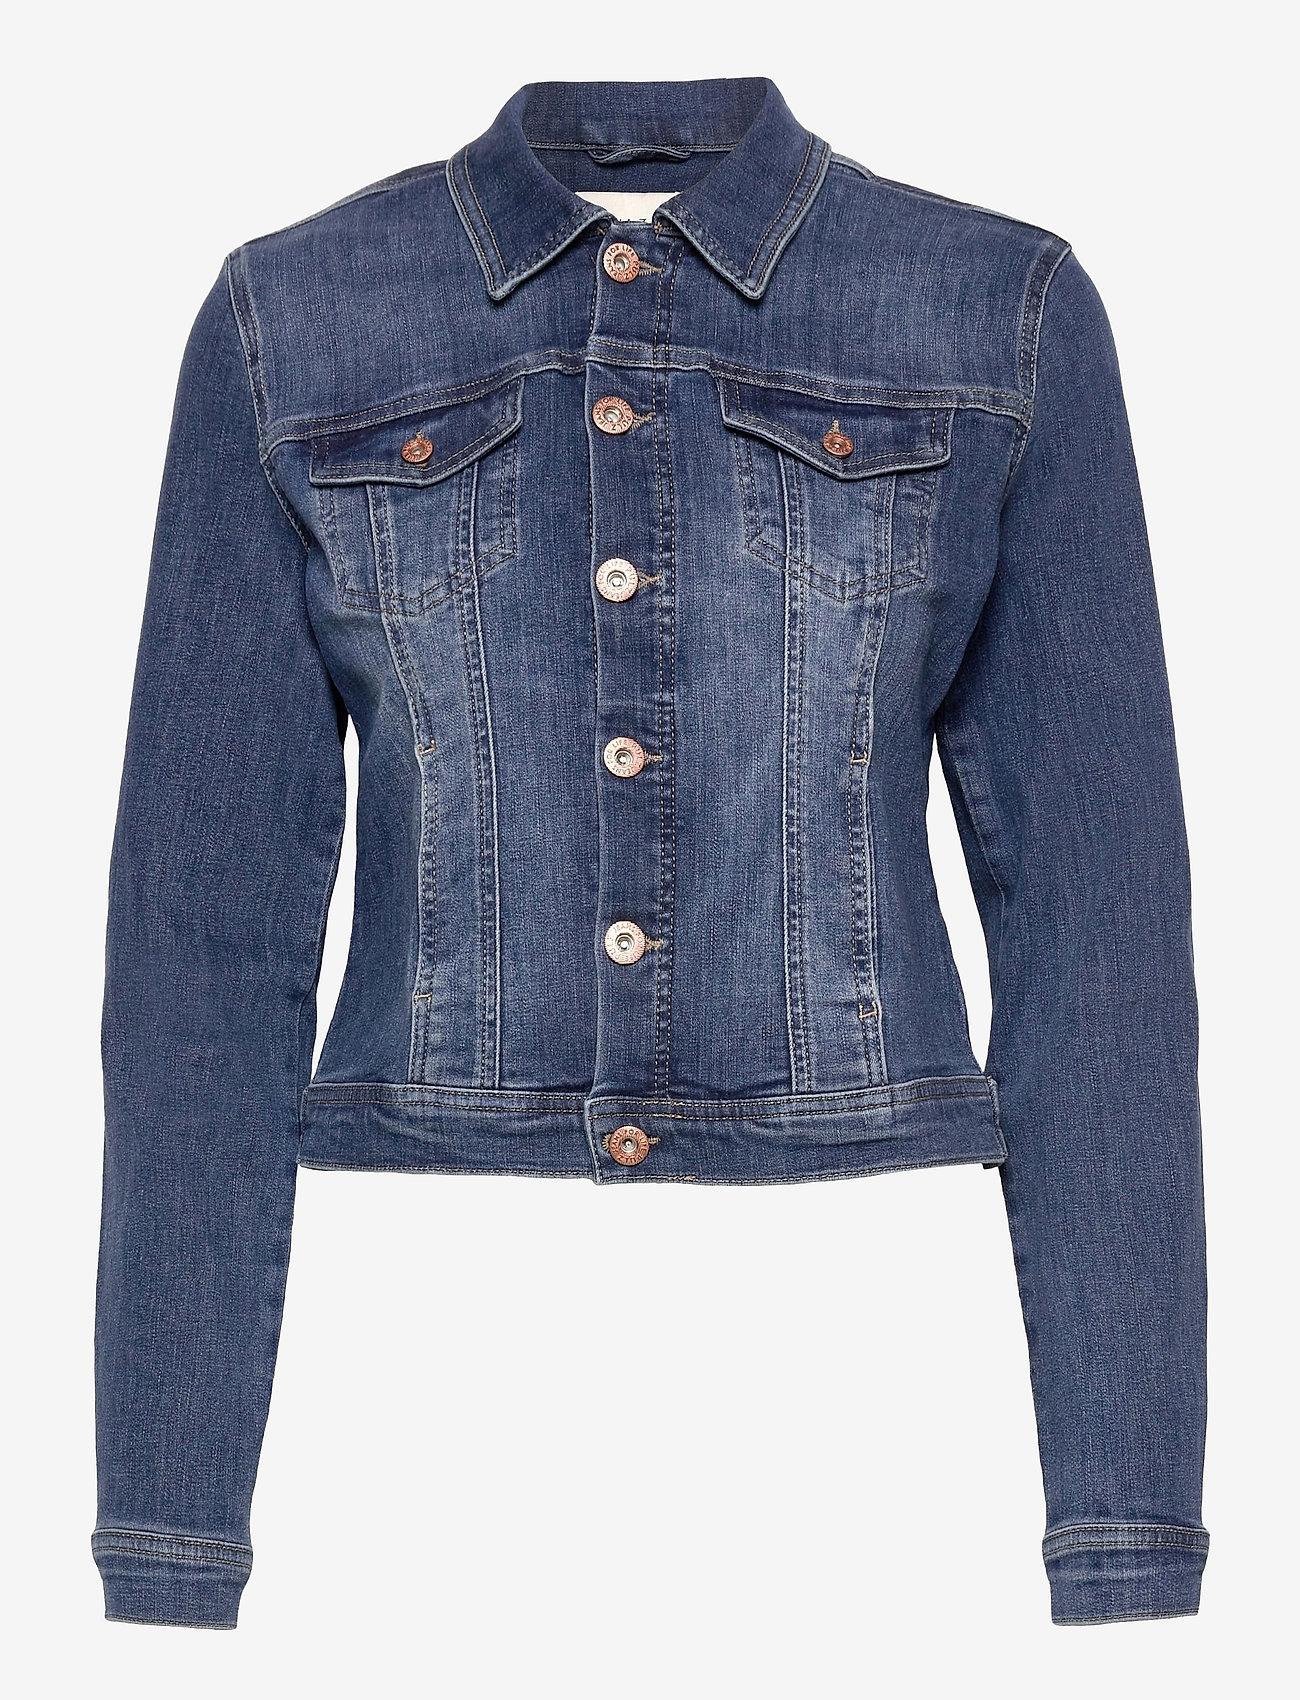 Pulz Jeans - PZSIRA Jacket - denimjakker - dark blue denim - 0